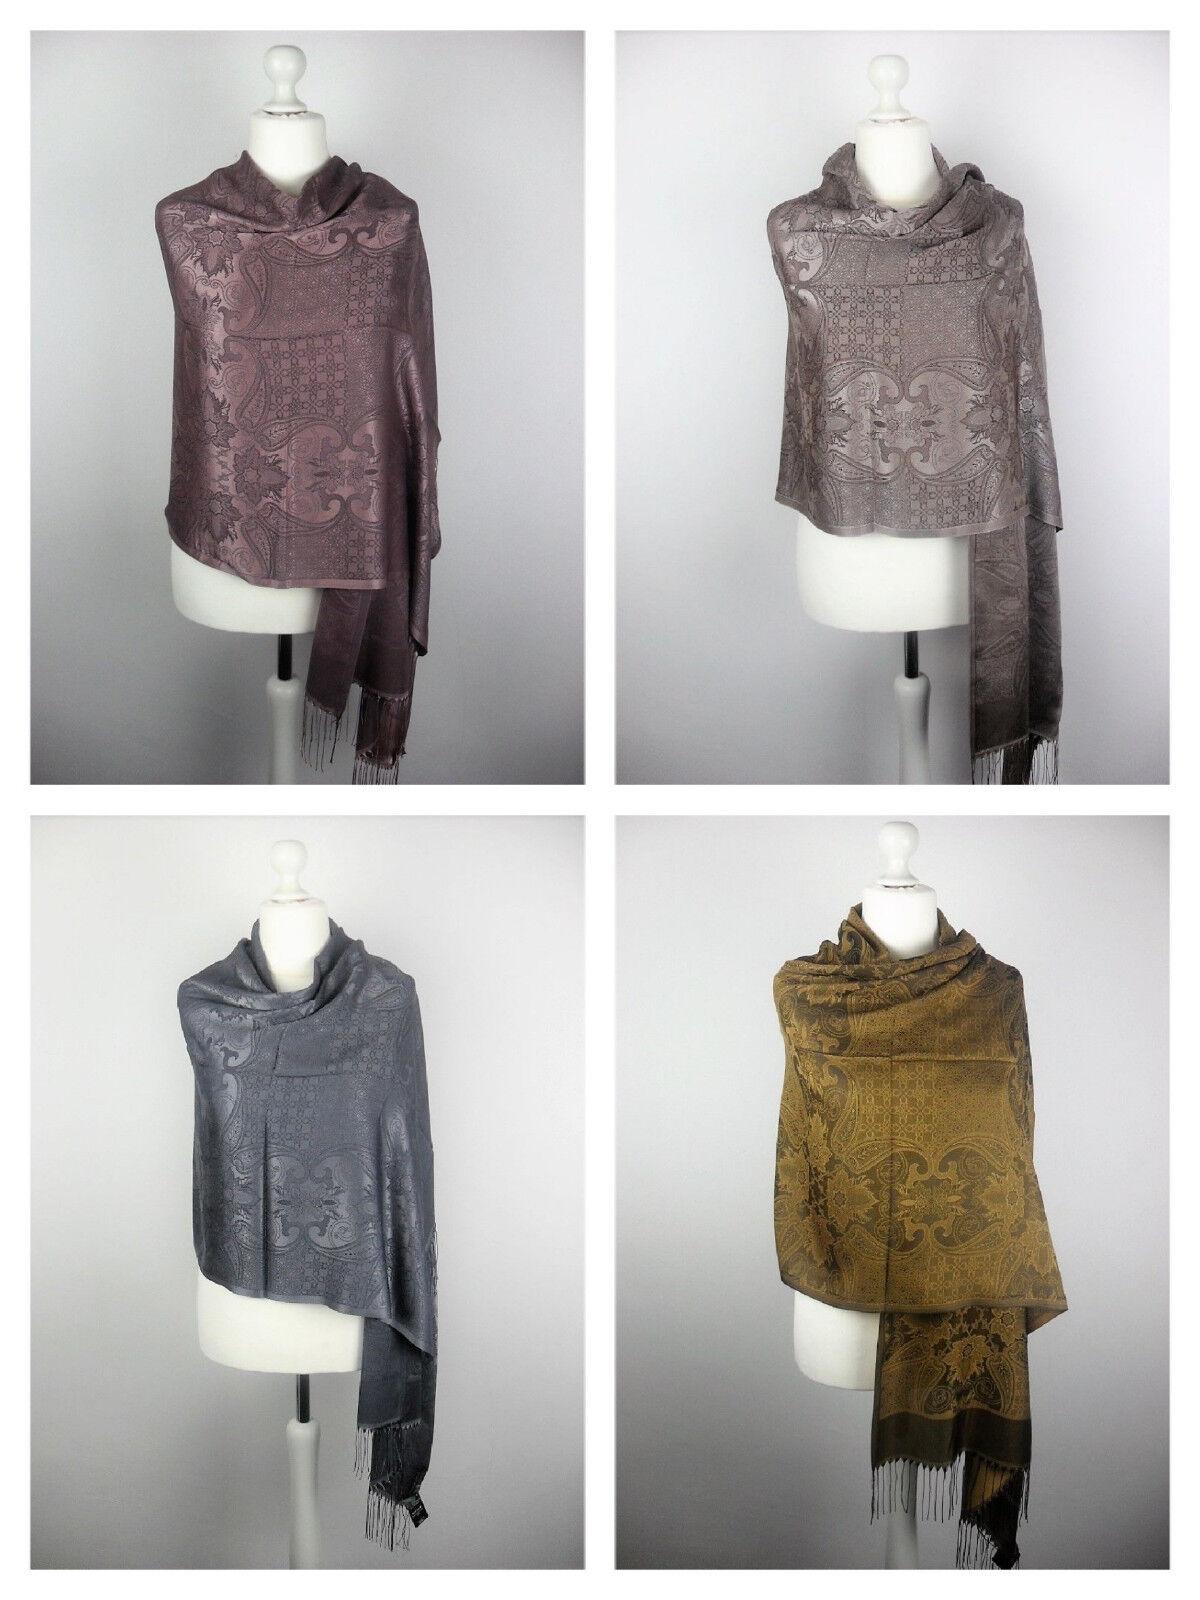 Pashmina Schal Tuch Stola Hijab 55% Viskose & 45%Polyacryl Altrosa Grau 183x70cm